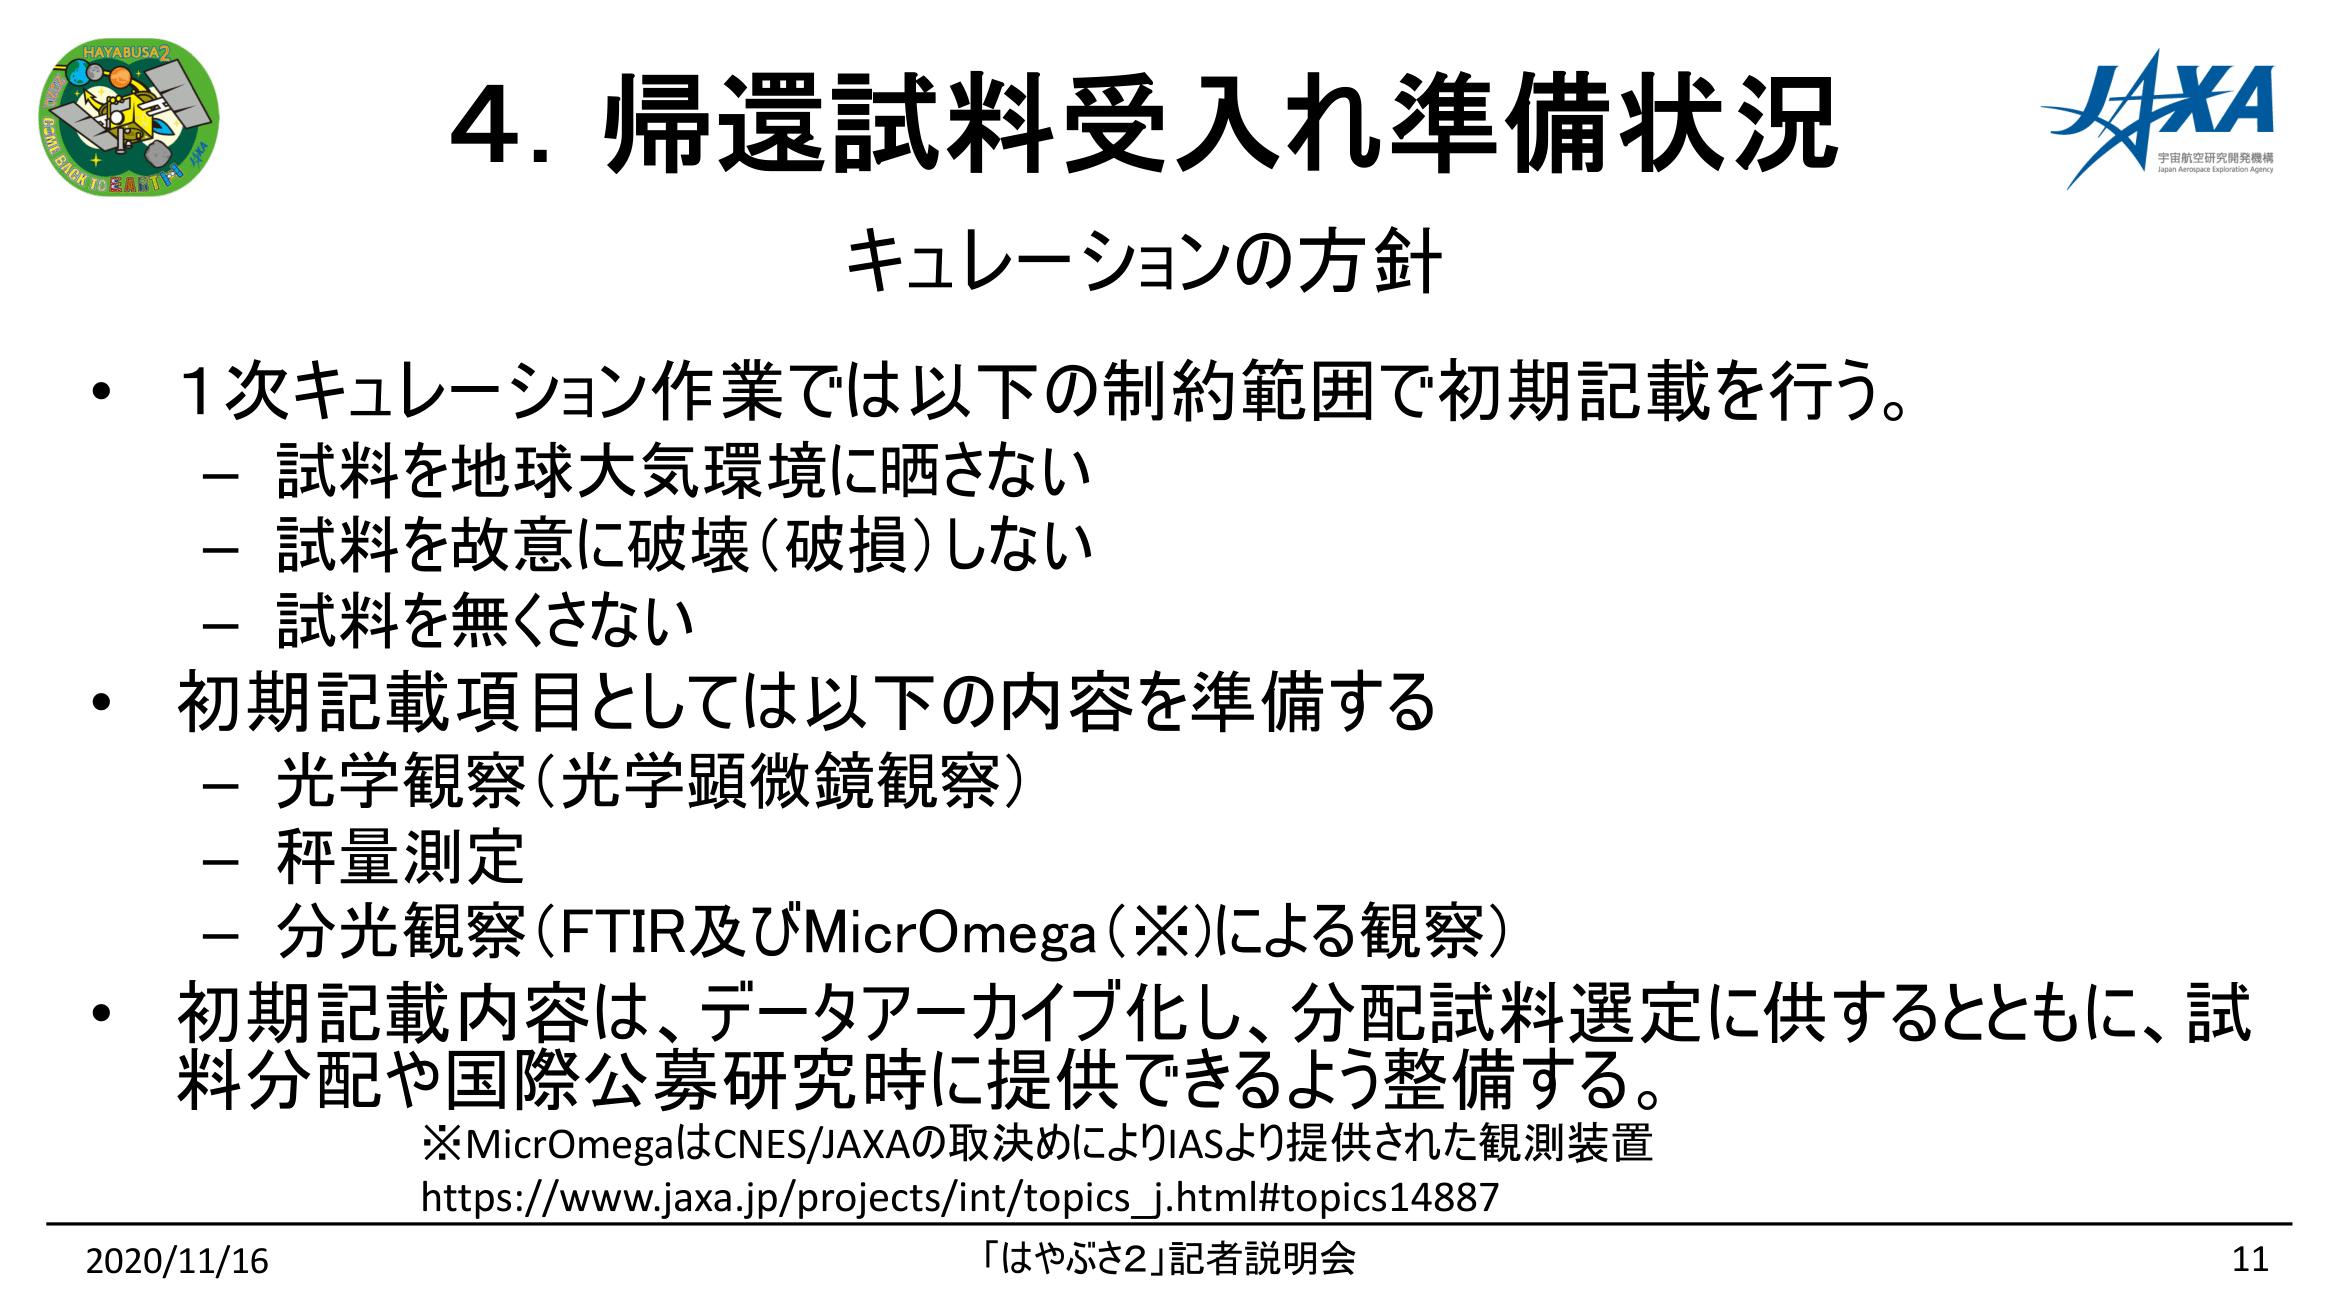 f:id:Imamura:20201116151219p:plain